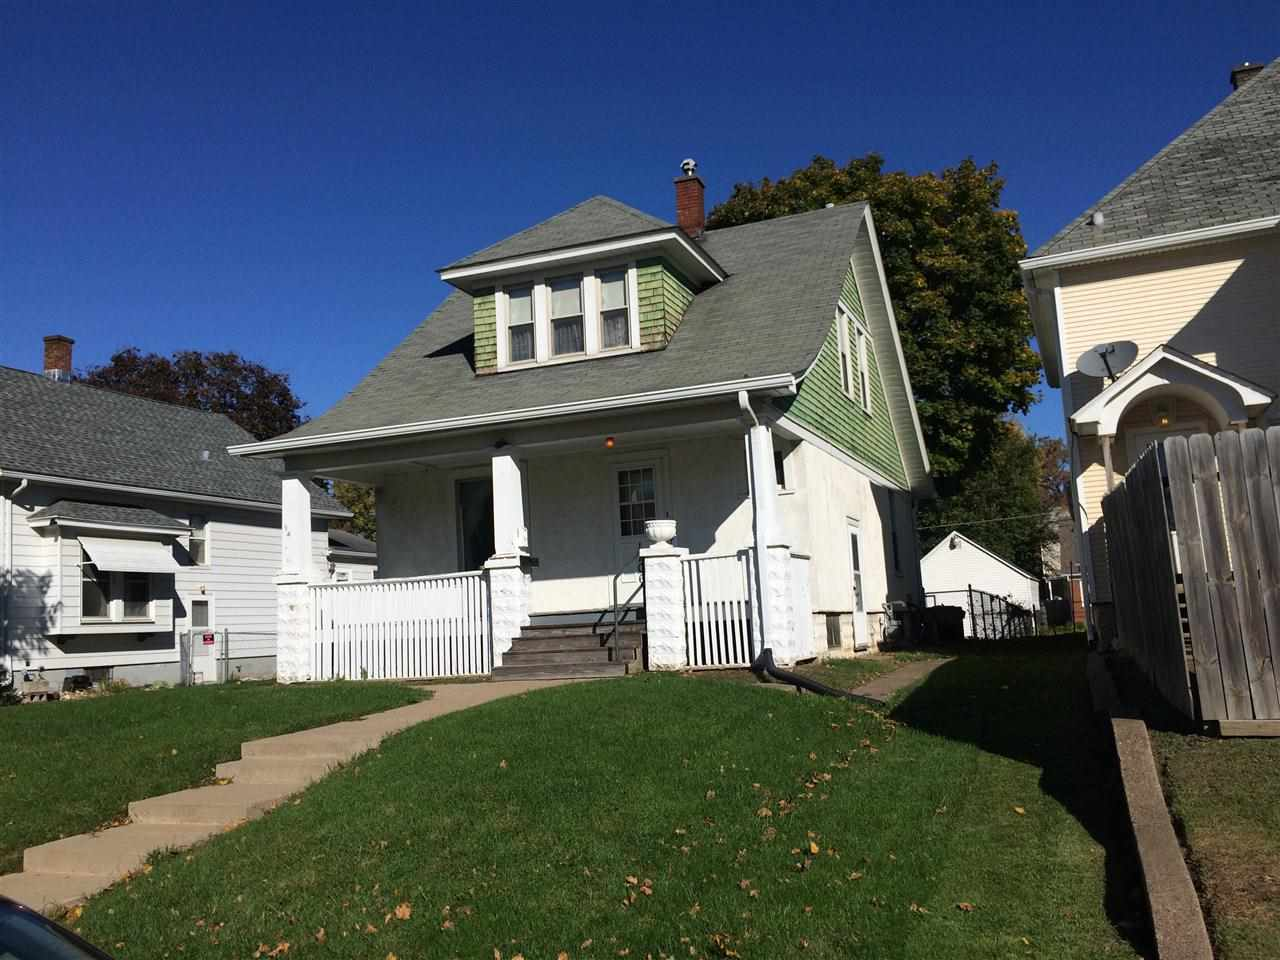 Rental Homes for Rent, ListingId:30357929, location: 1706 W 16TH Davenport 52806